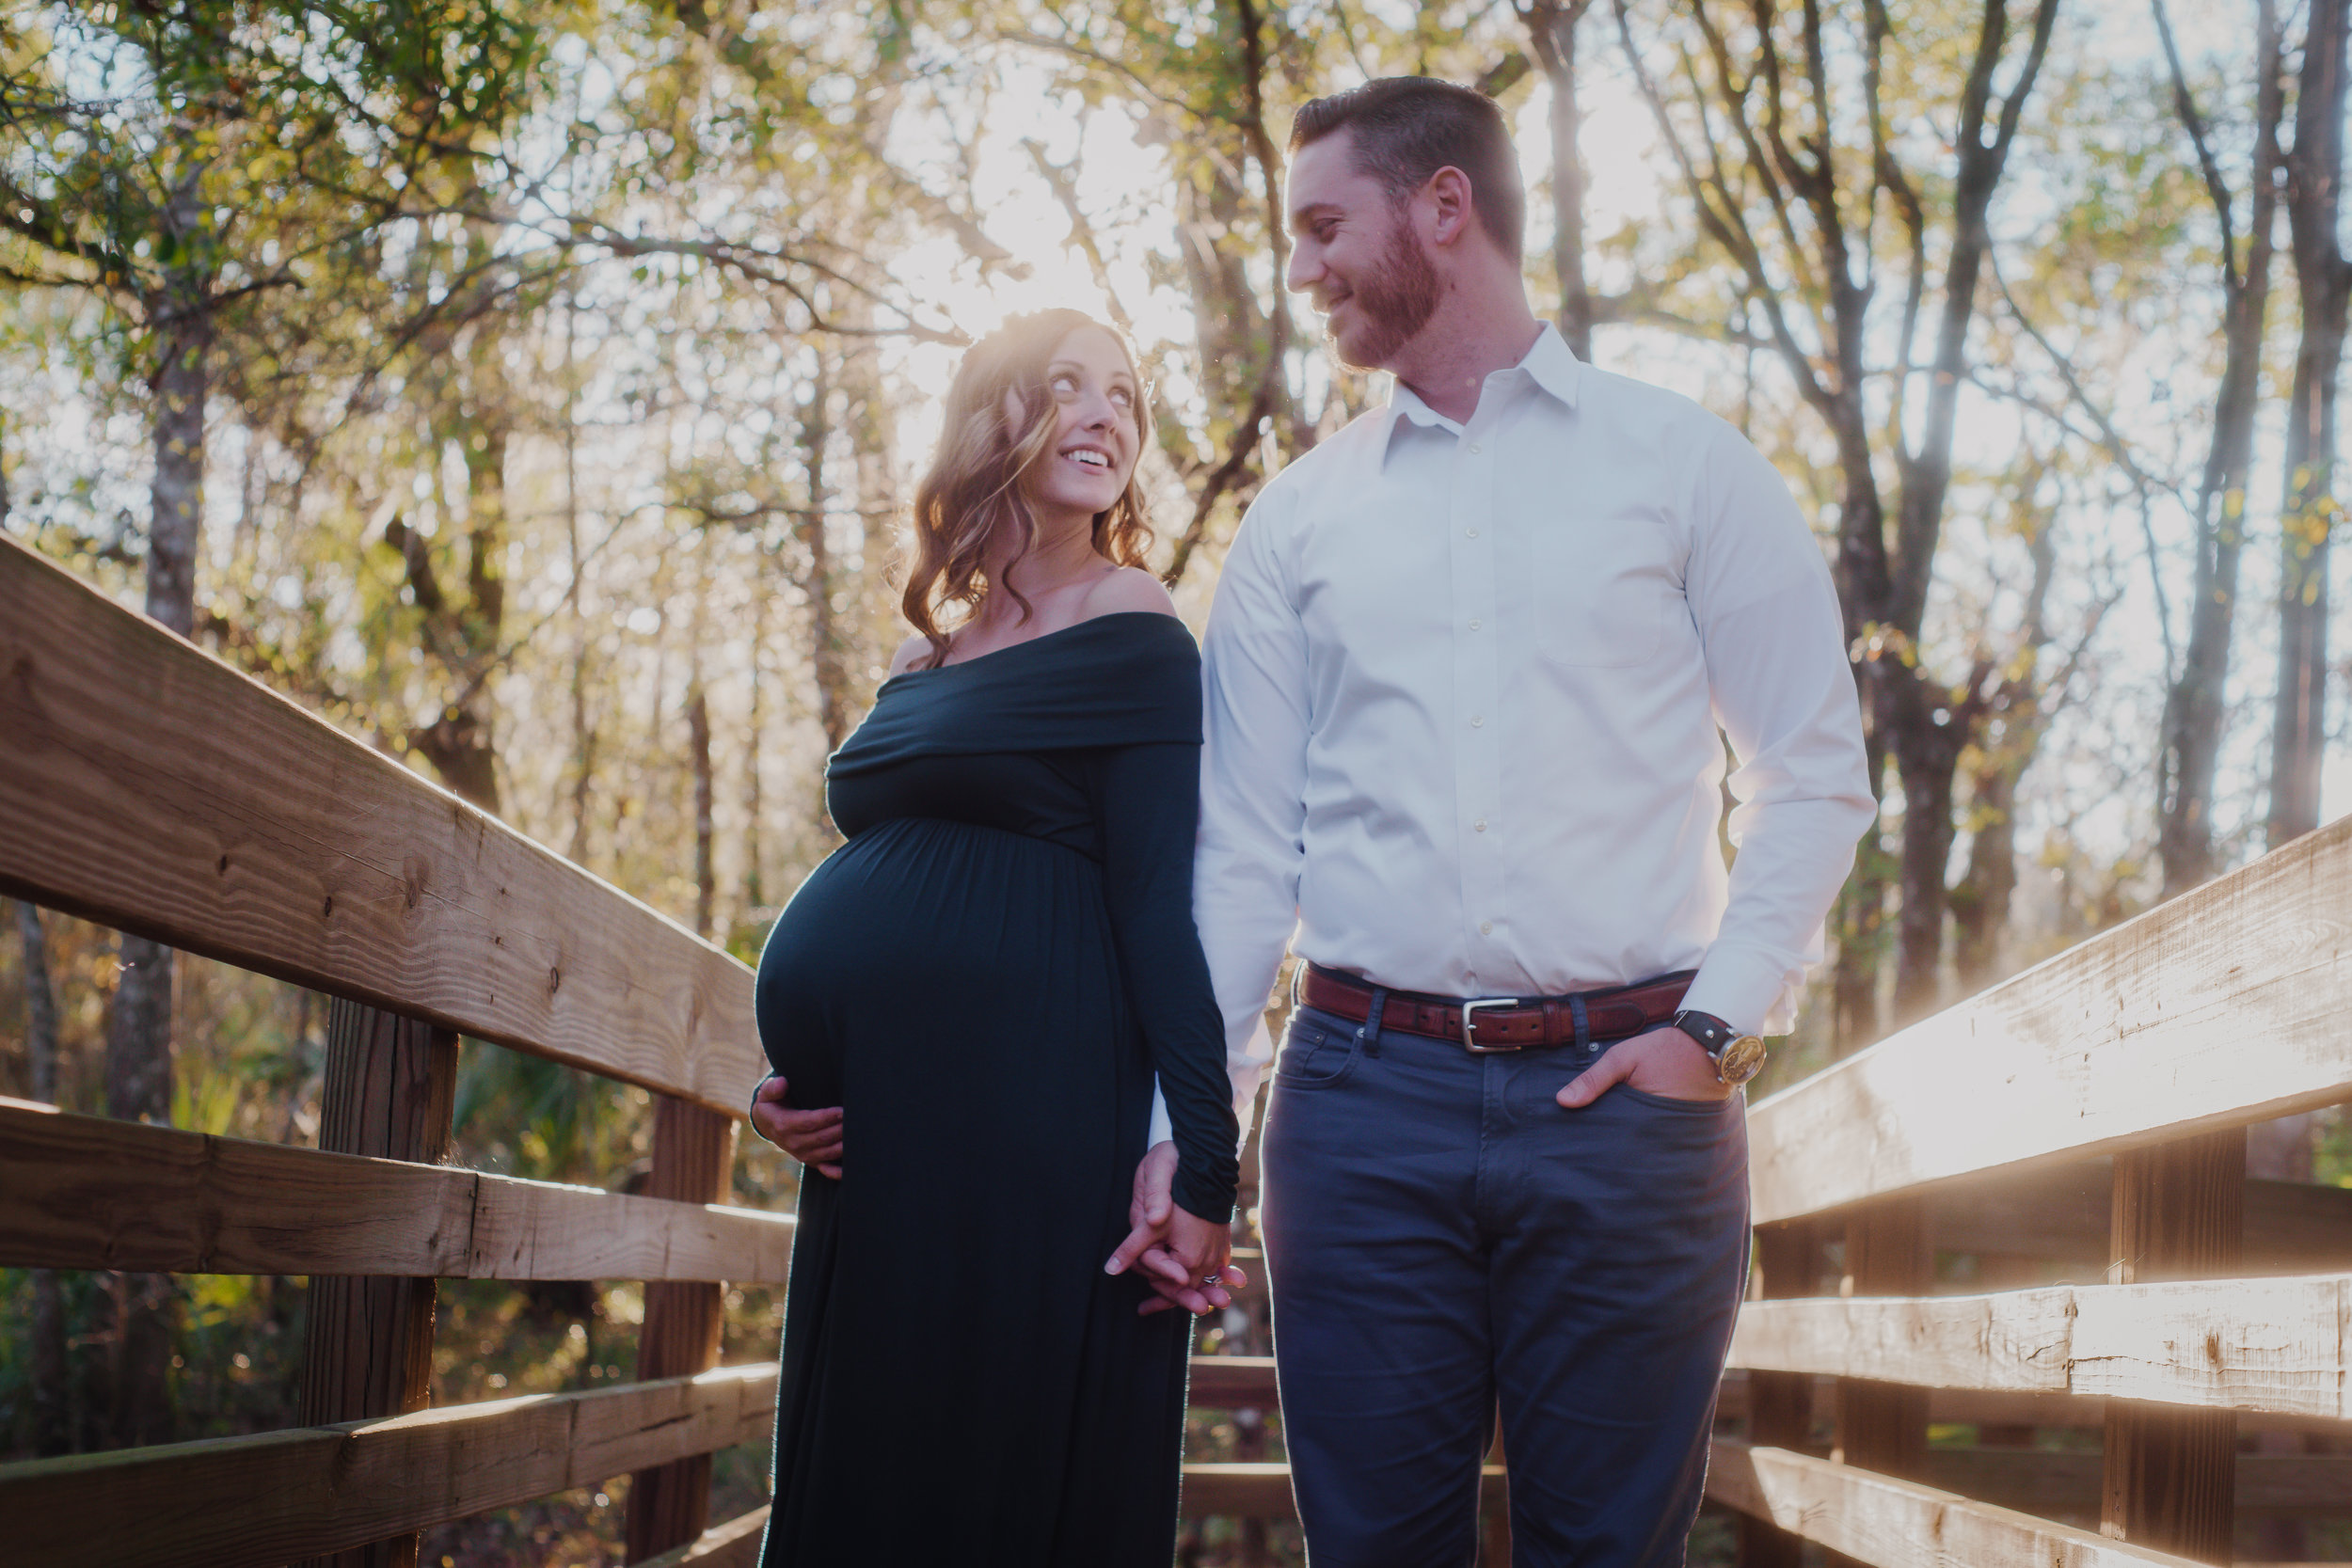 Tampa-maternity-session-at-lettuce-lake-park